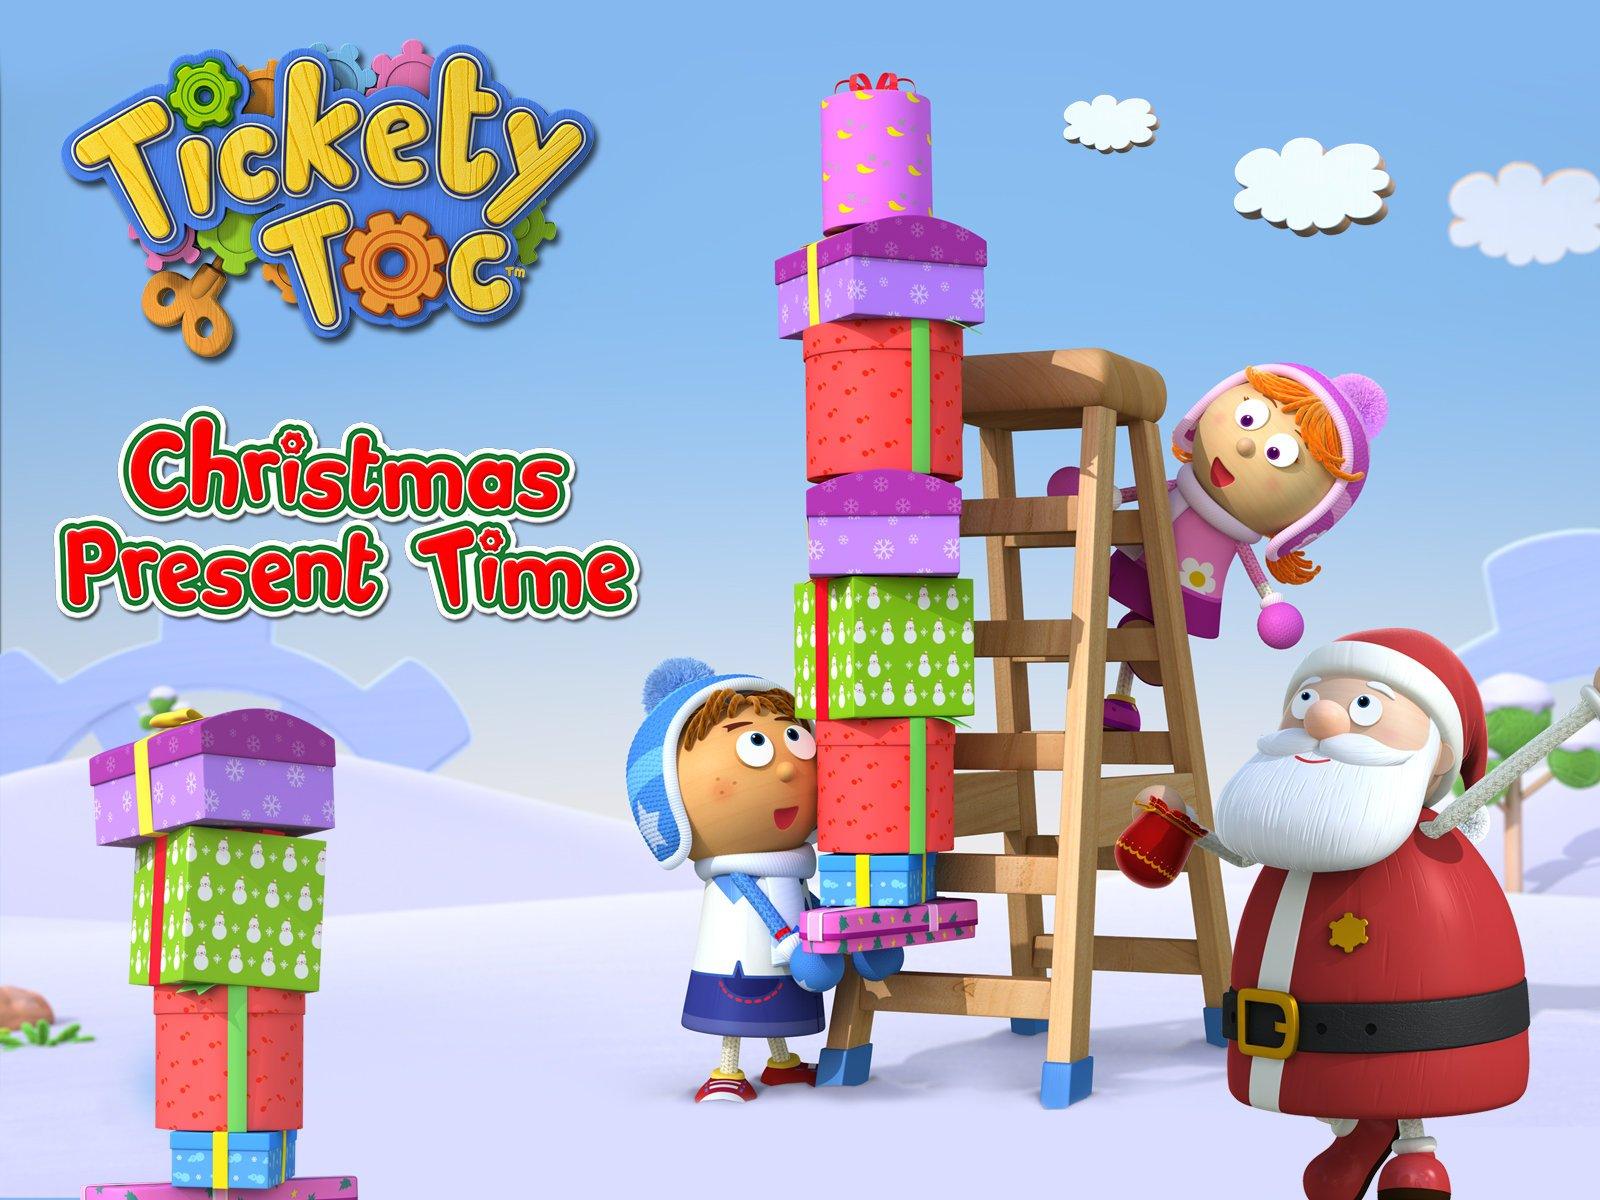 Amazon.com: Tickety Toc Christmas Present Time: Zachary Gordon ...